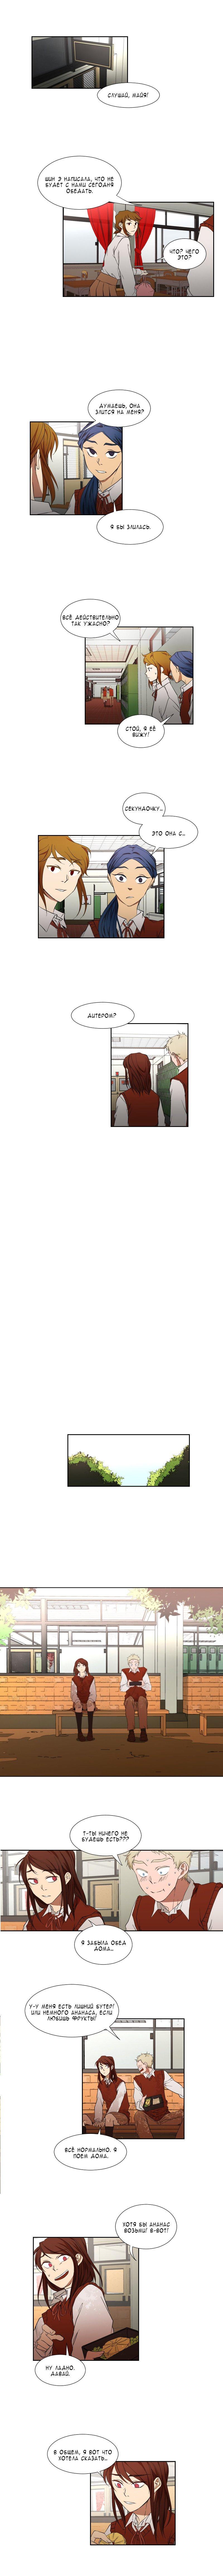 Манга Я люблю Ю / I love Yoo  - Том 1 Глава 19 Страница 6